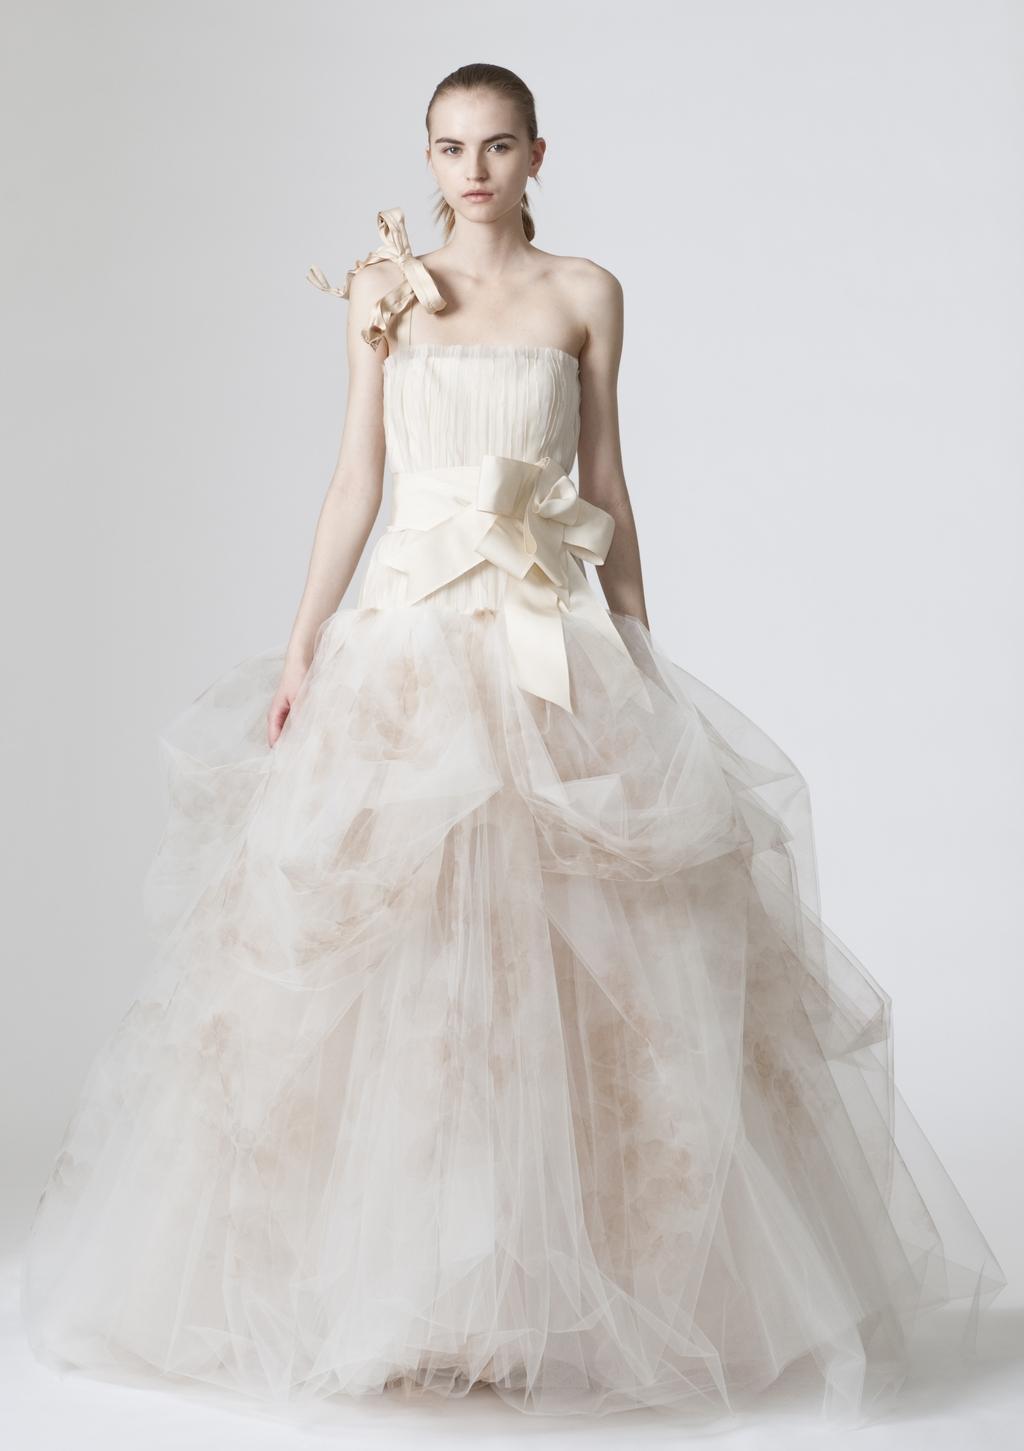 Vera-wang-wedding-dresses-spring-2010-13.full